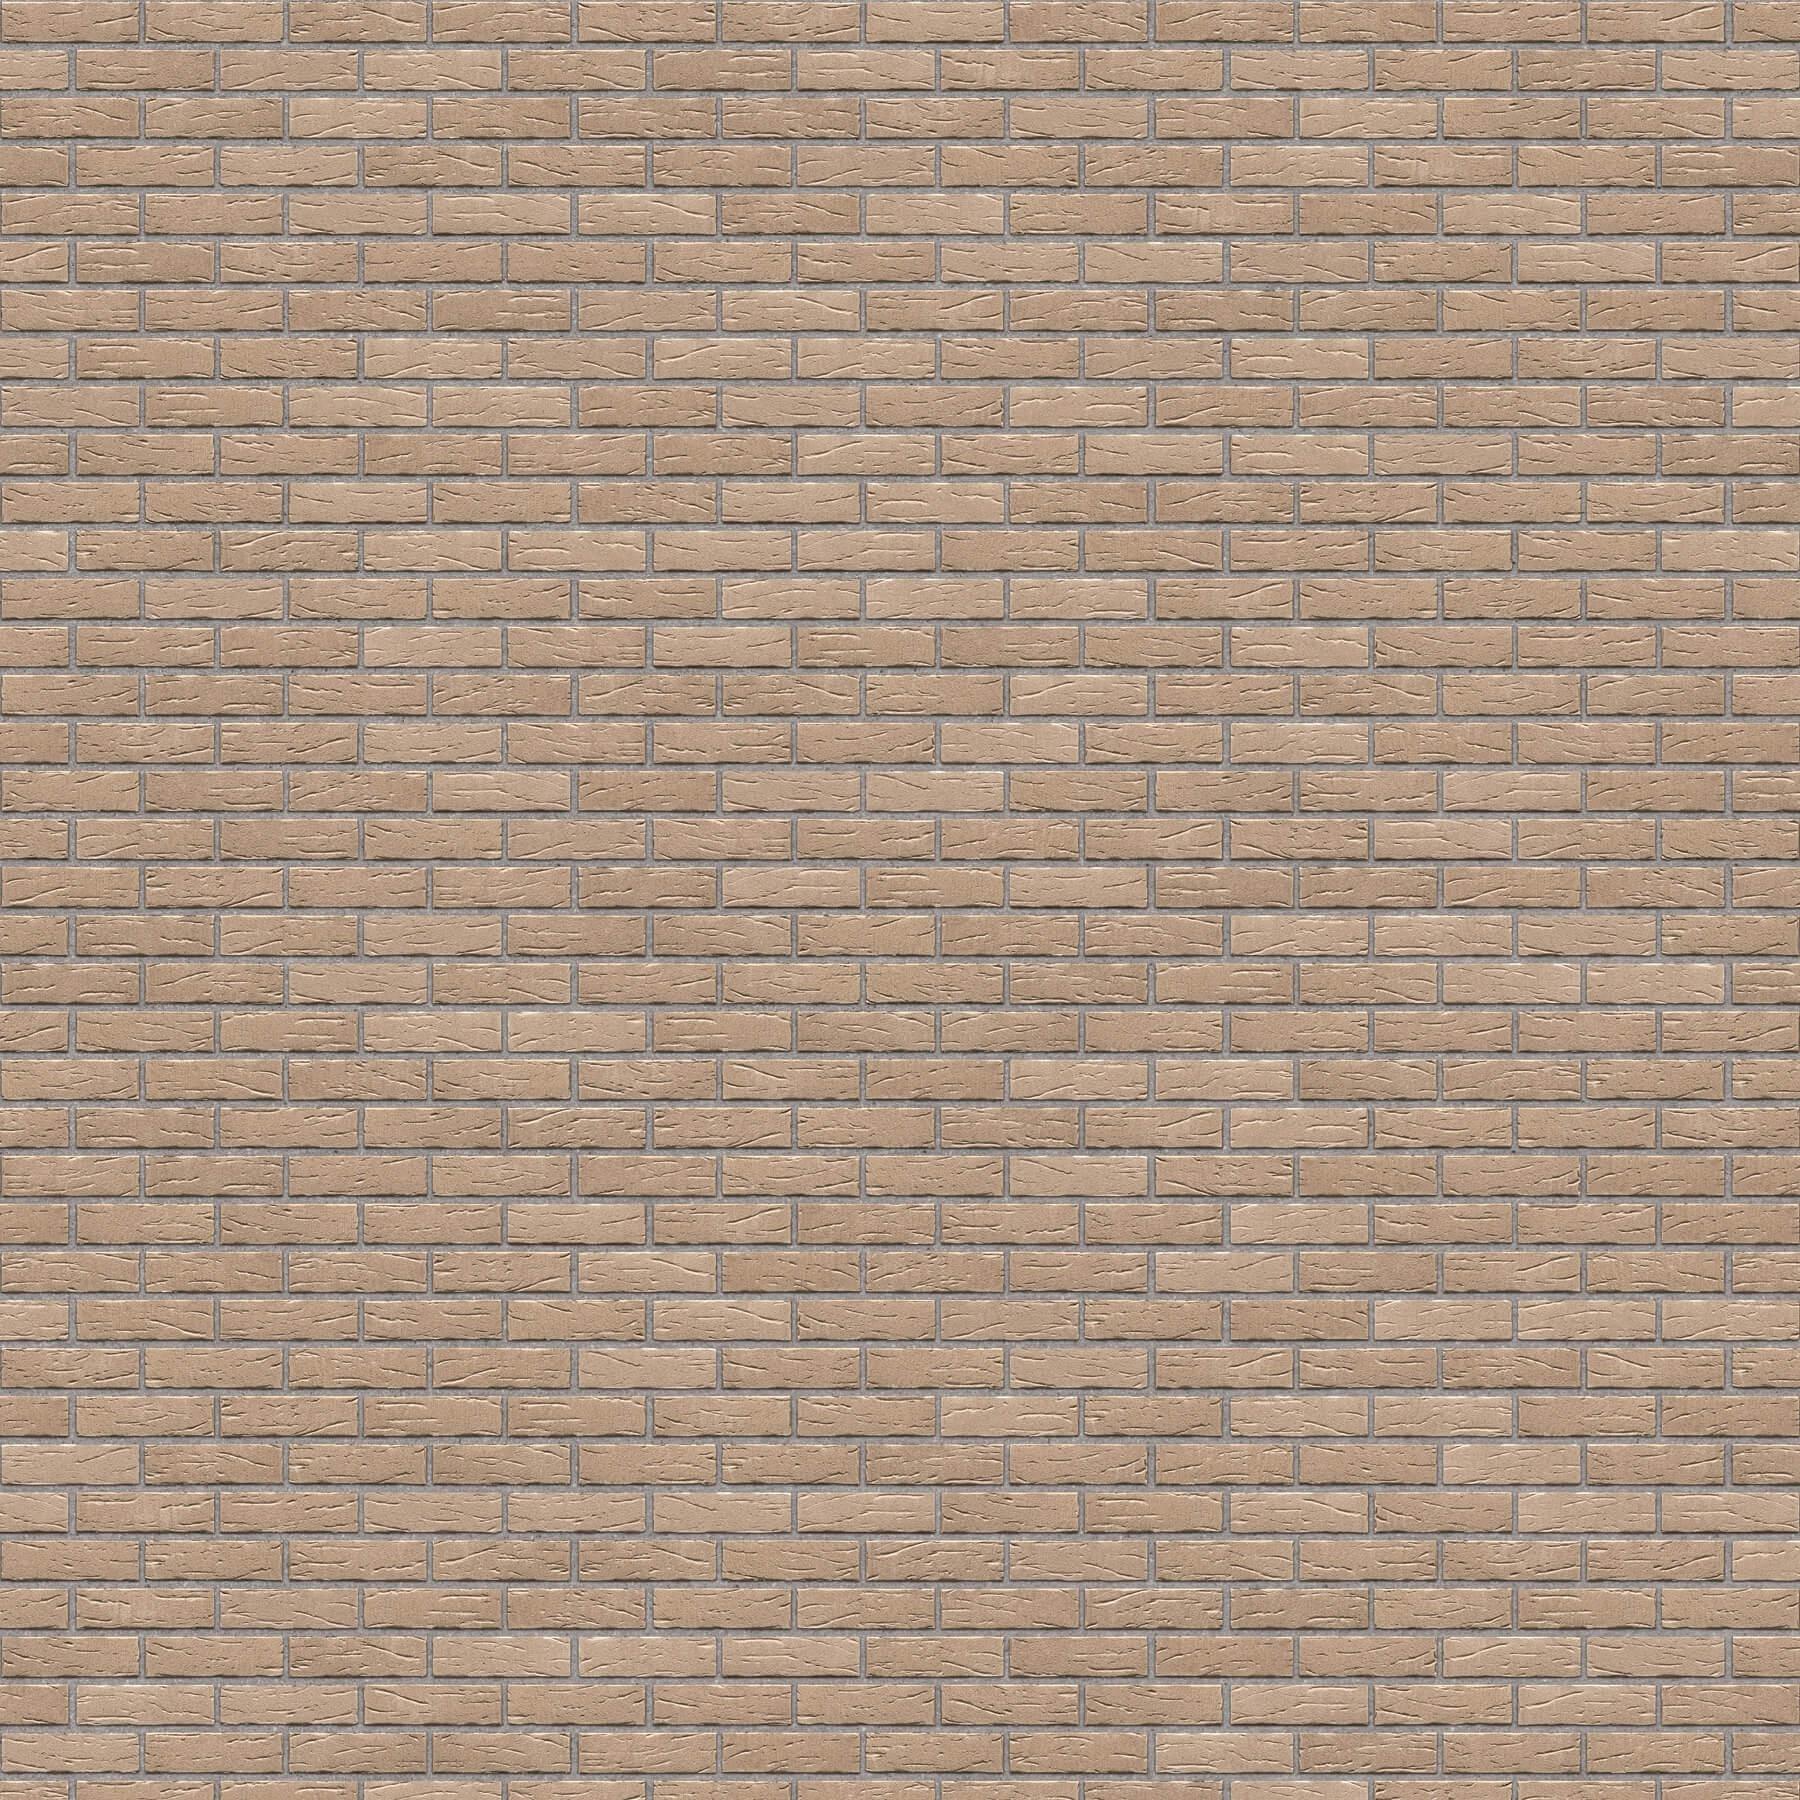 Dekorativna cigla listela FeldHaus Klinker r-680 nf Siva Fuga